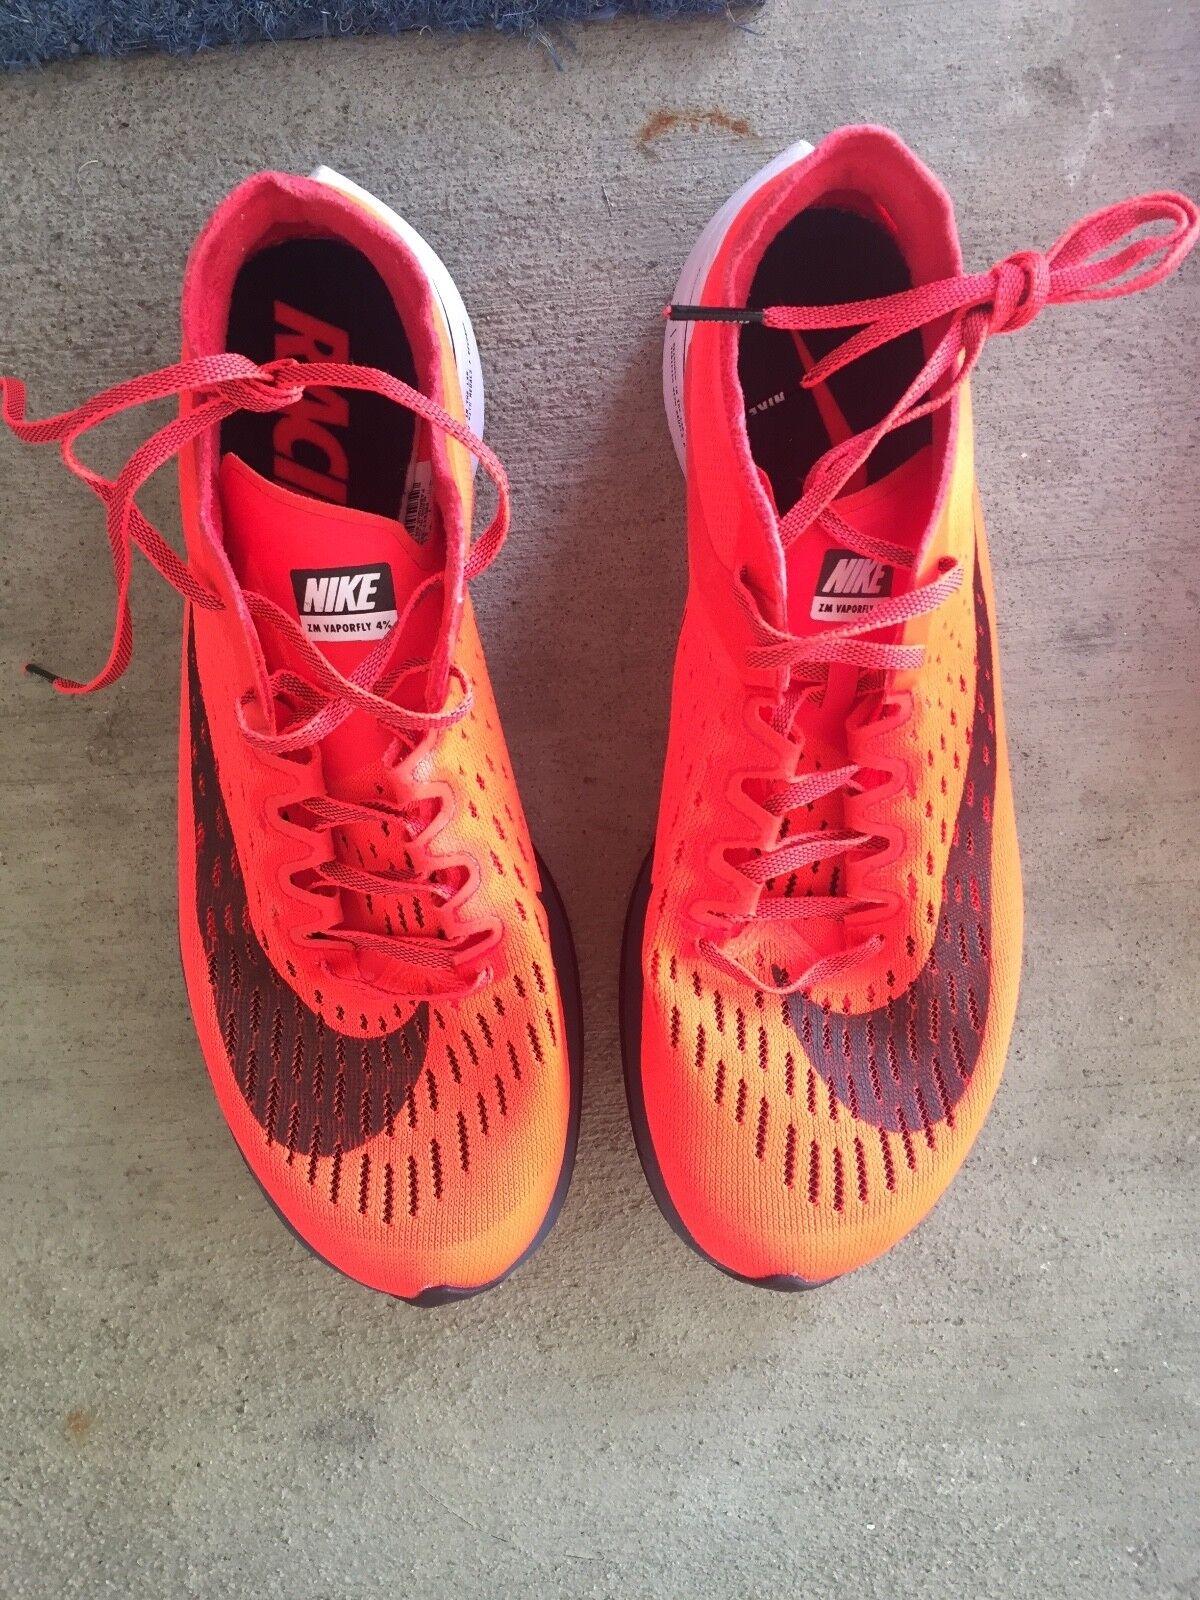 Nike Mens Zoom Vaporfly 4% Bright Crimson Black Red Race. Men's size 8.